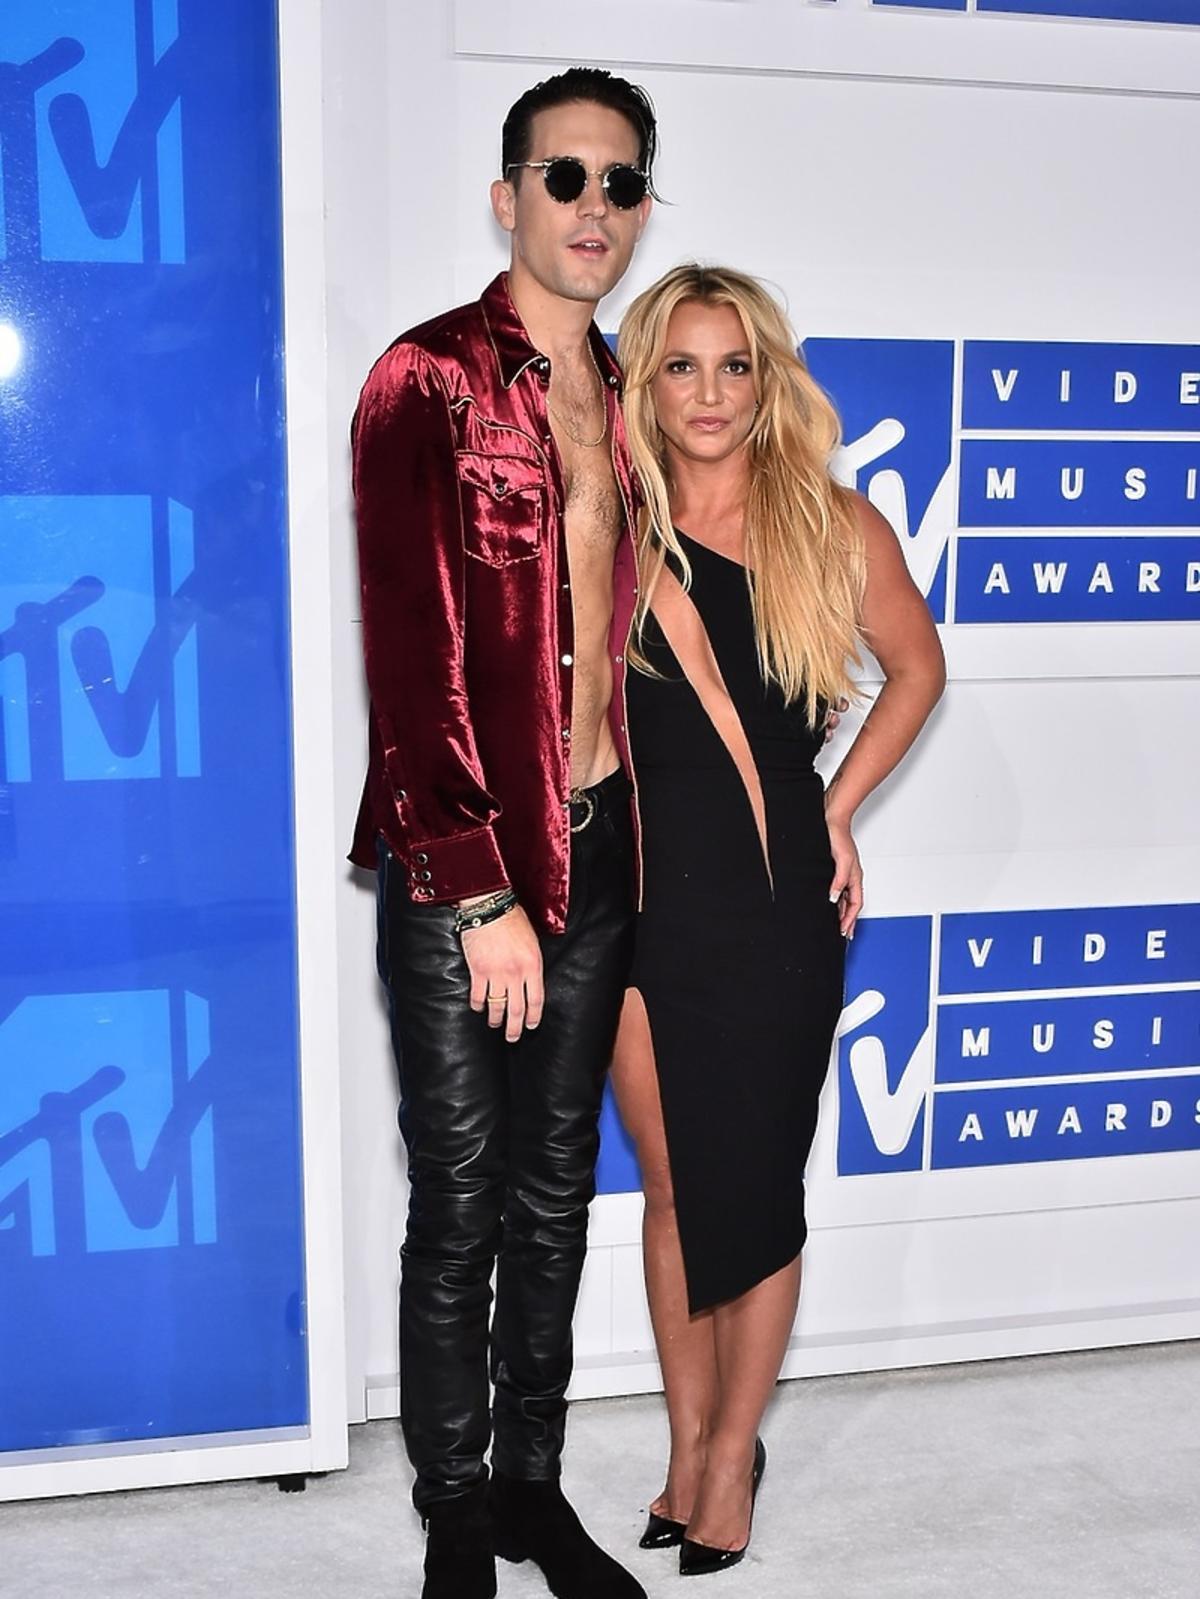 Gala MTV Video Music Awards 2016 E-Gazy, Britney Spears